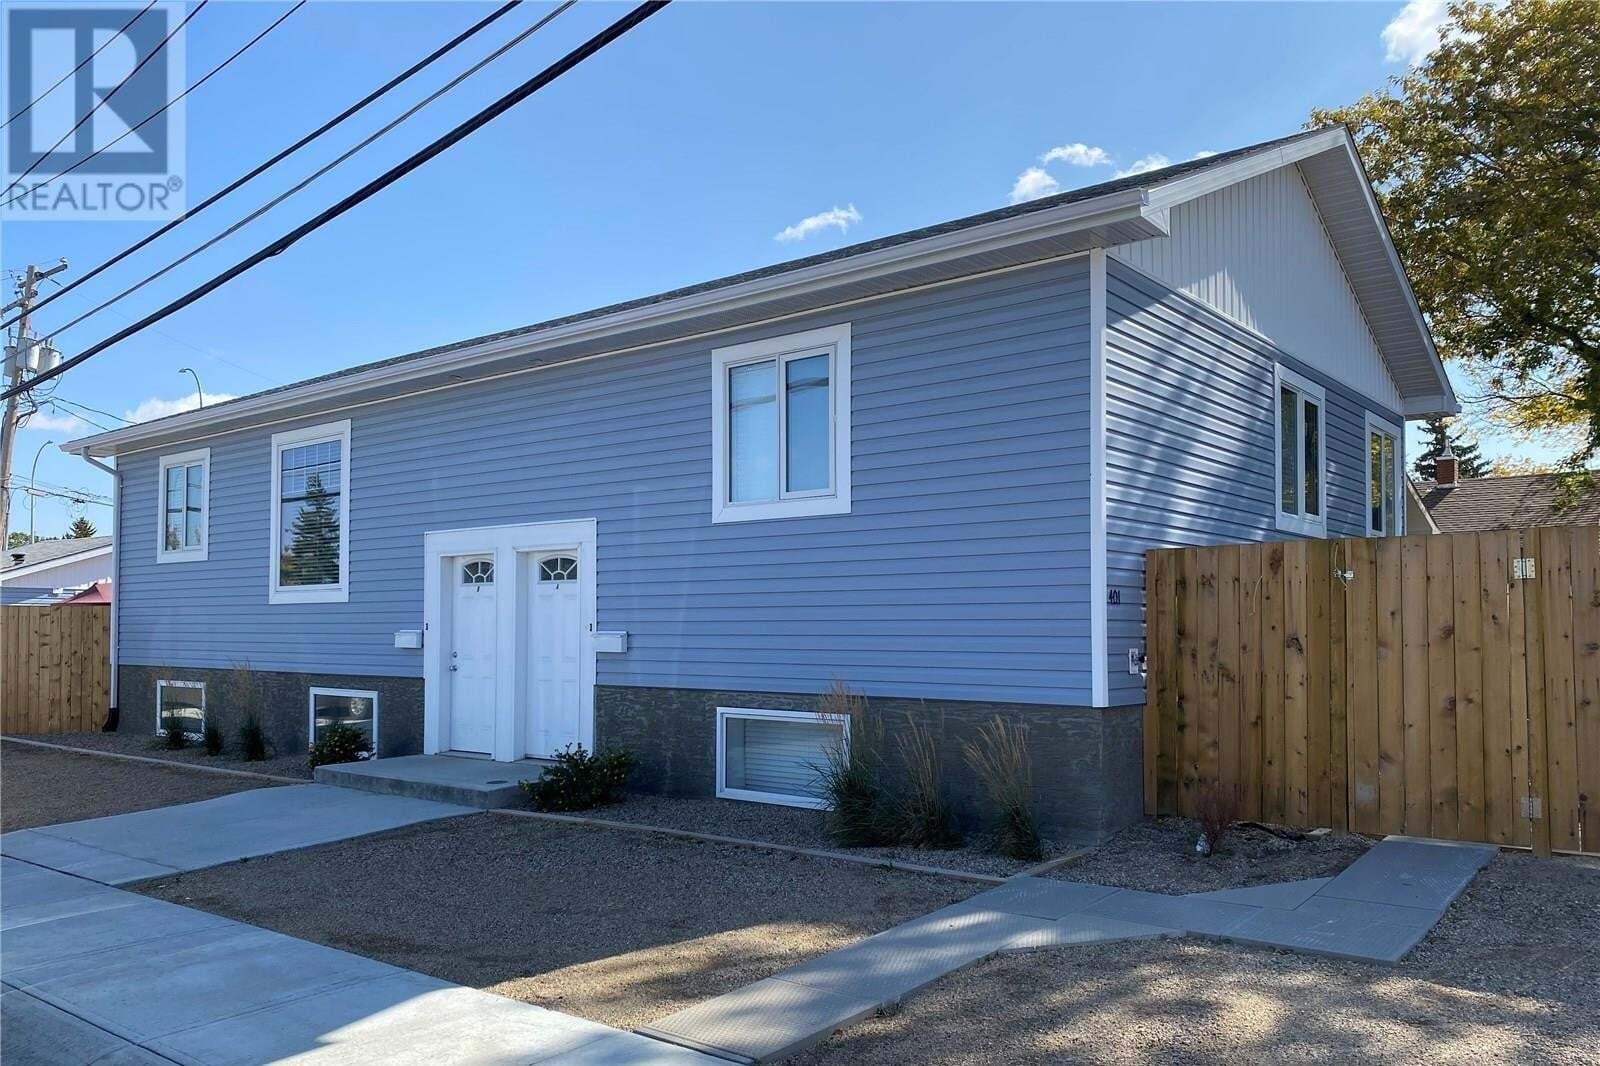 House for sale at 401 Edward St Regina Saskatchewan - MLS: SK827610